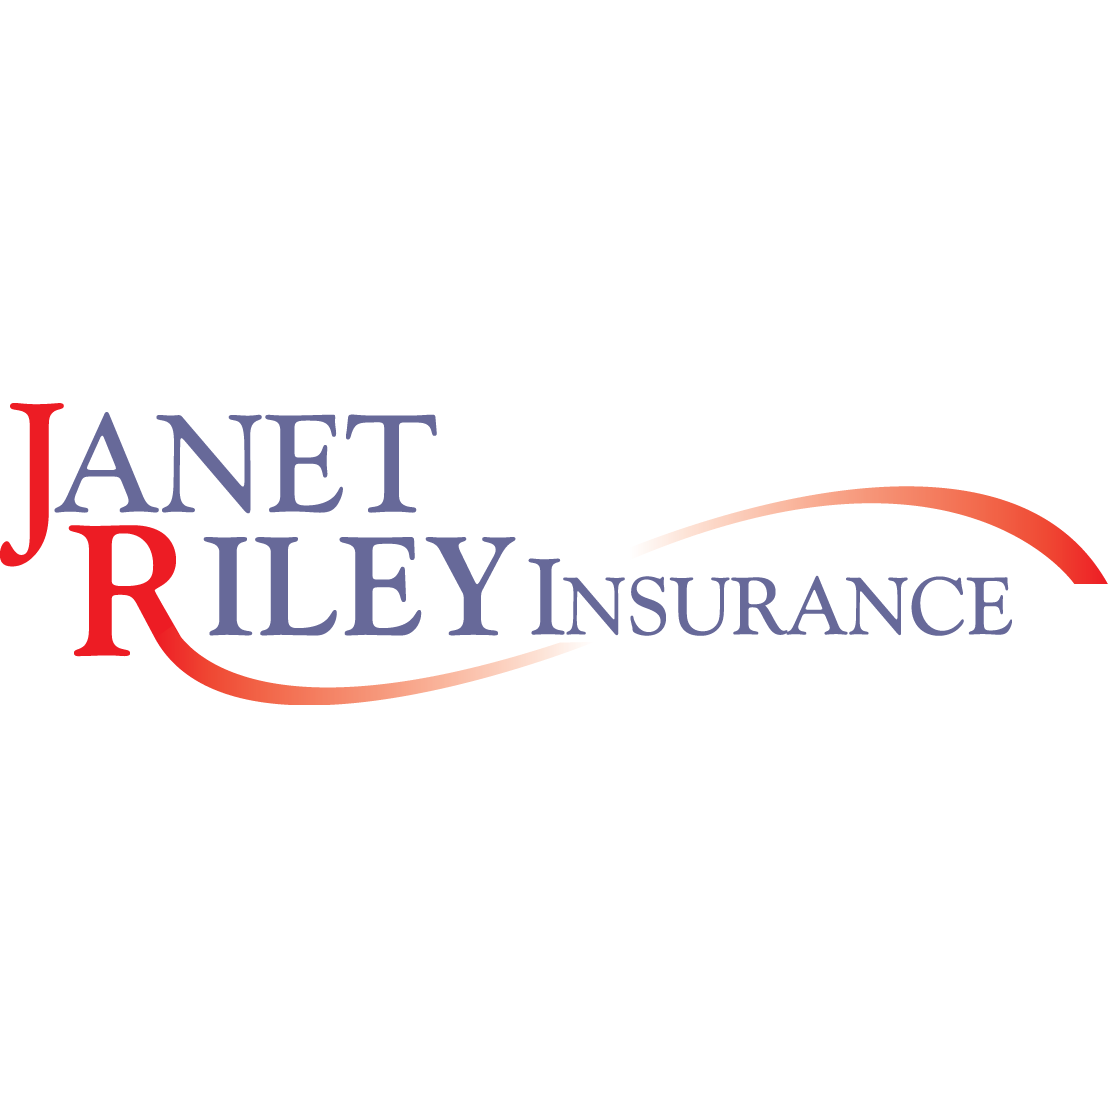 Janet Riley Insurance - Janet Riley Agt